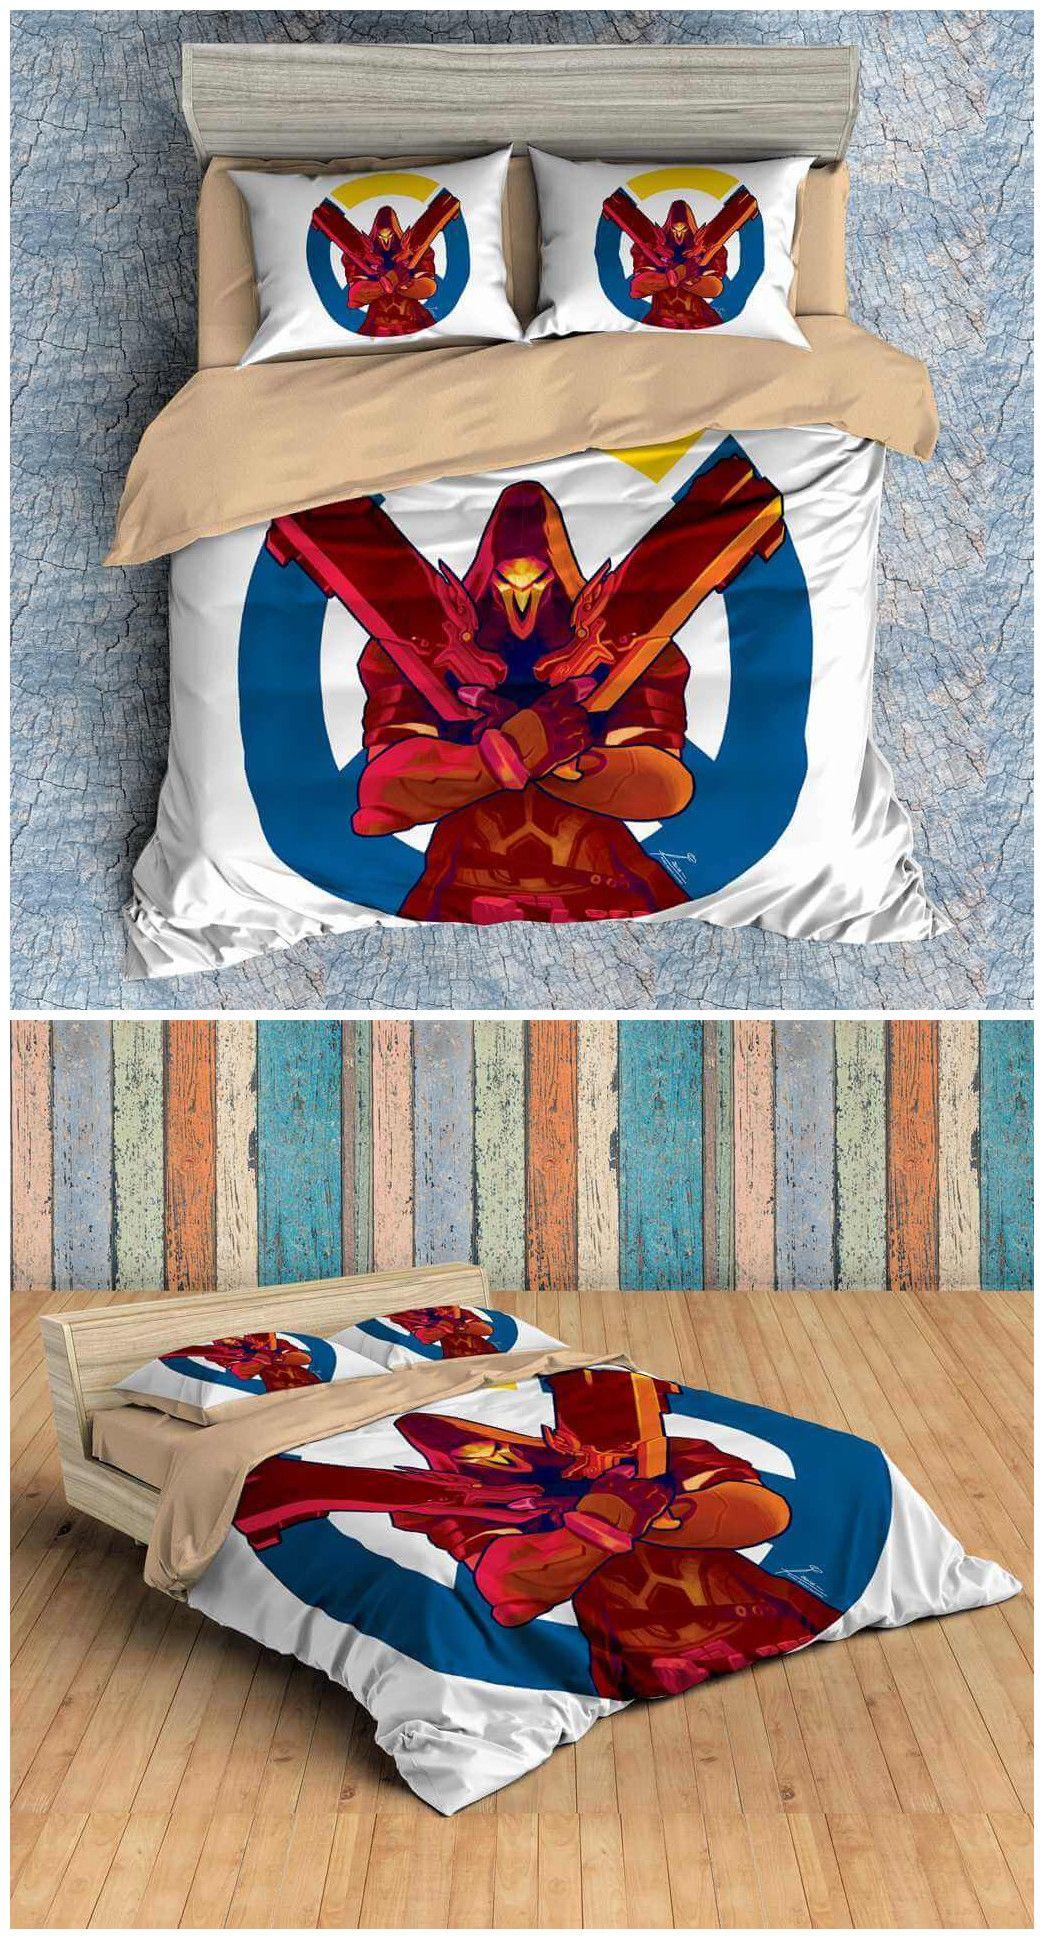 3D Customize Overwatch Bedding Set Duvet Cover Set Bedroom